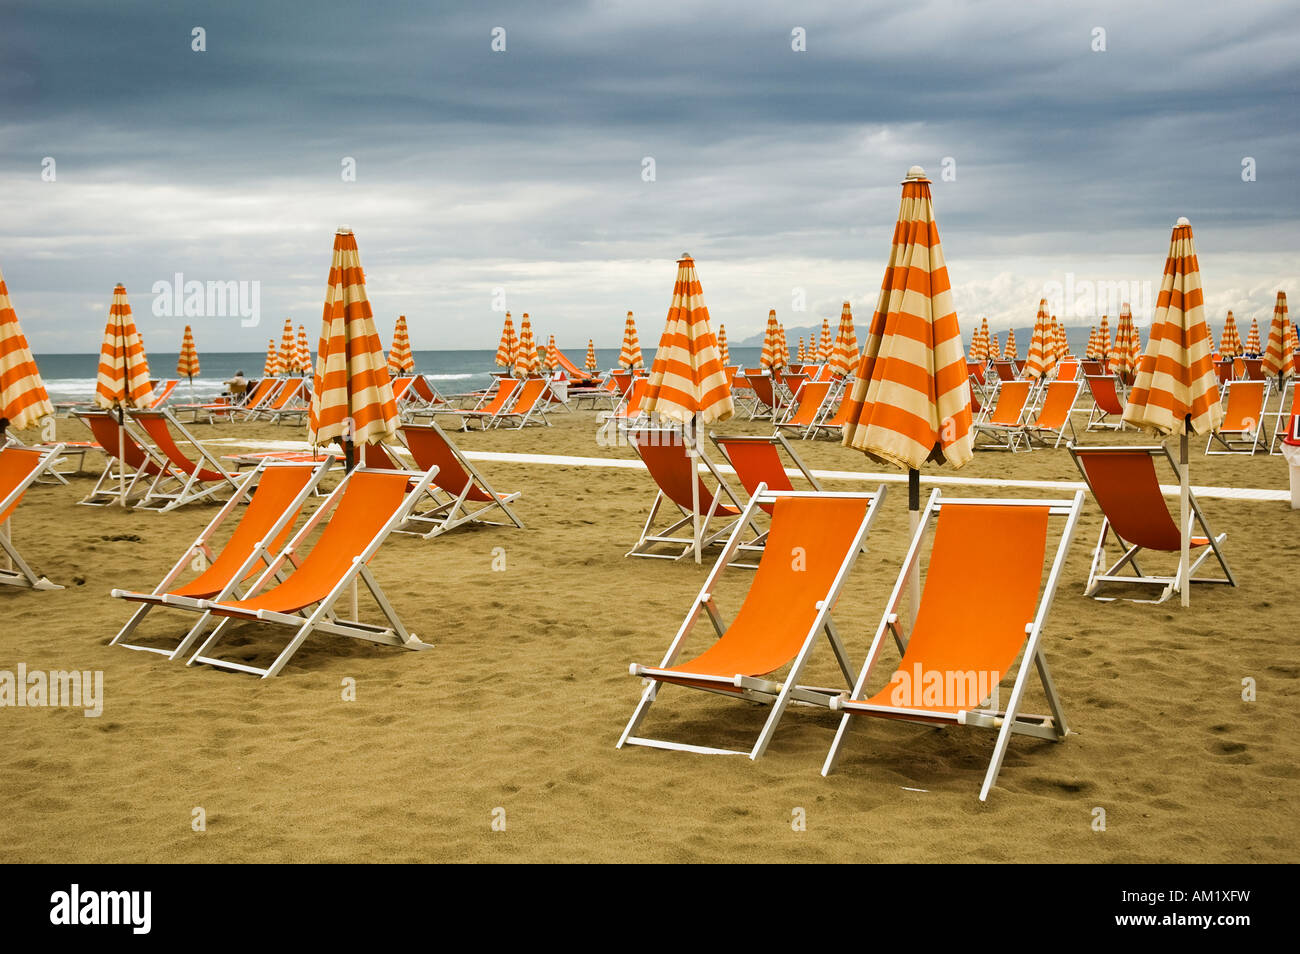 Orange deckchairs on a deserted beach in Viareggio Italy - Stock Image